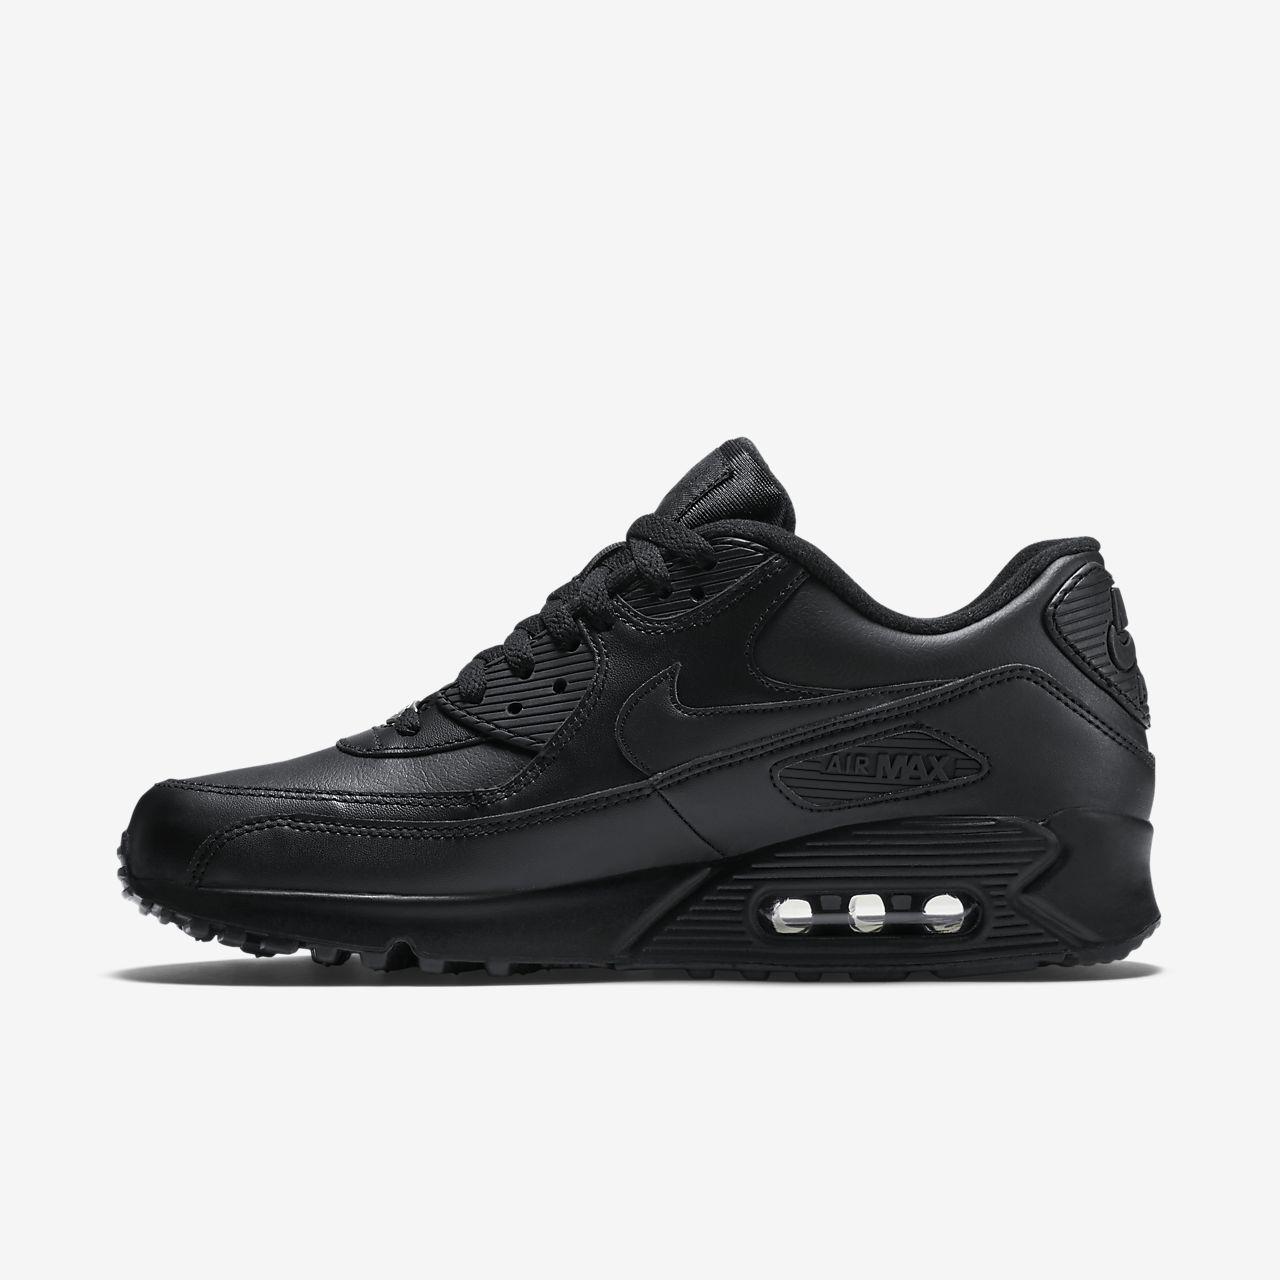 nike air max 90 homme chaussures brun